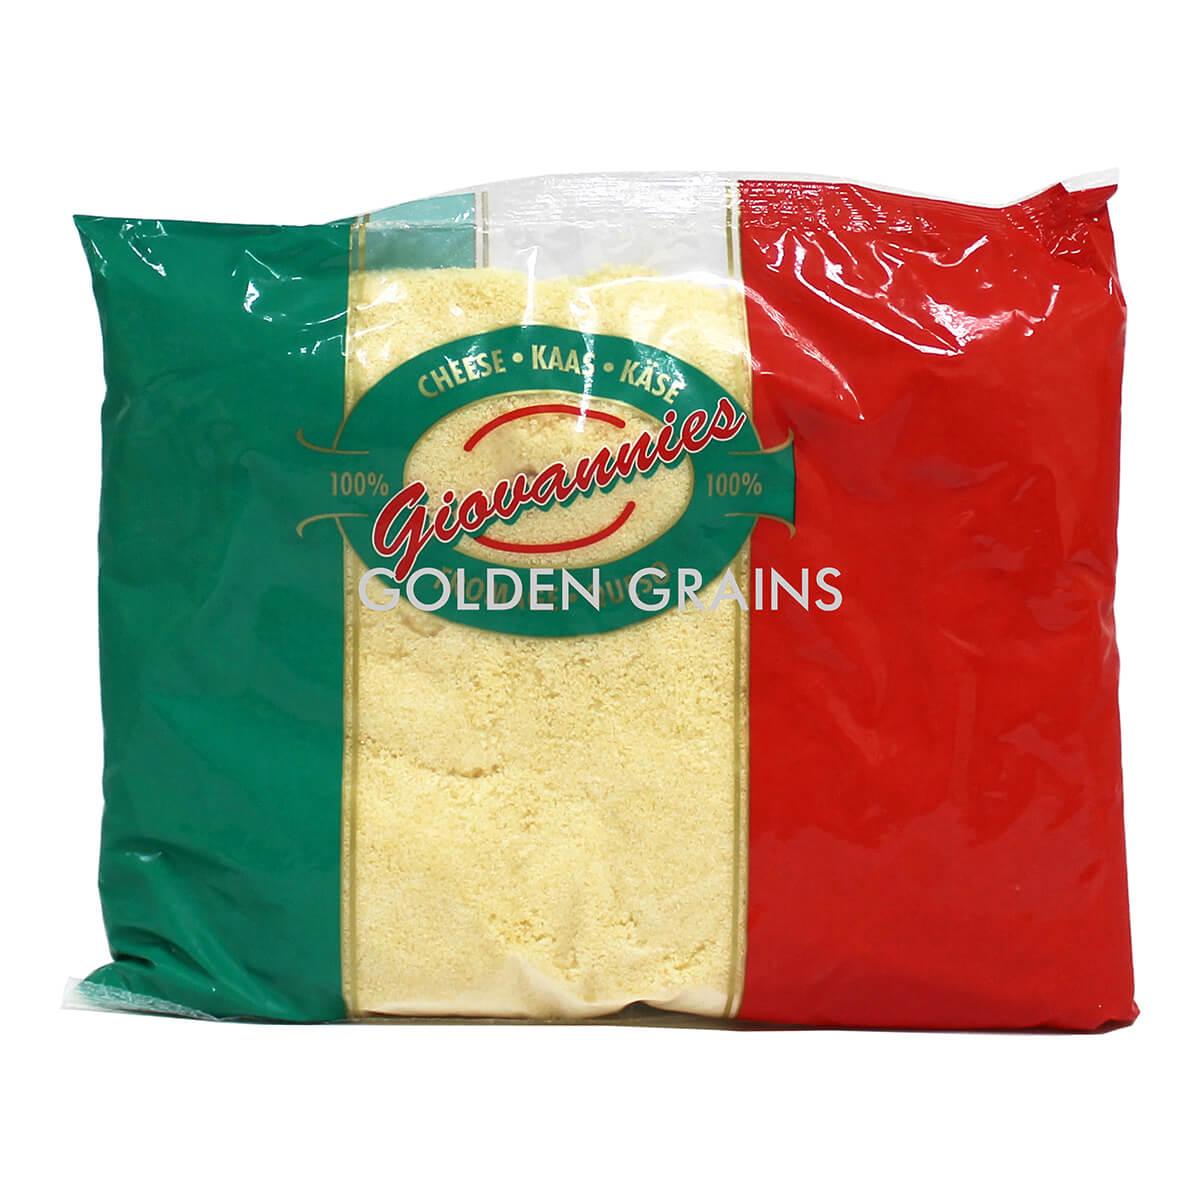 Golden Grains Dubai Export - Giovannies - Front.jpg